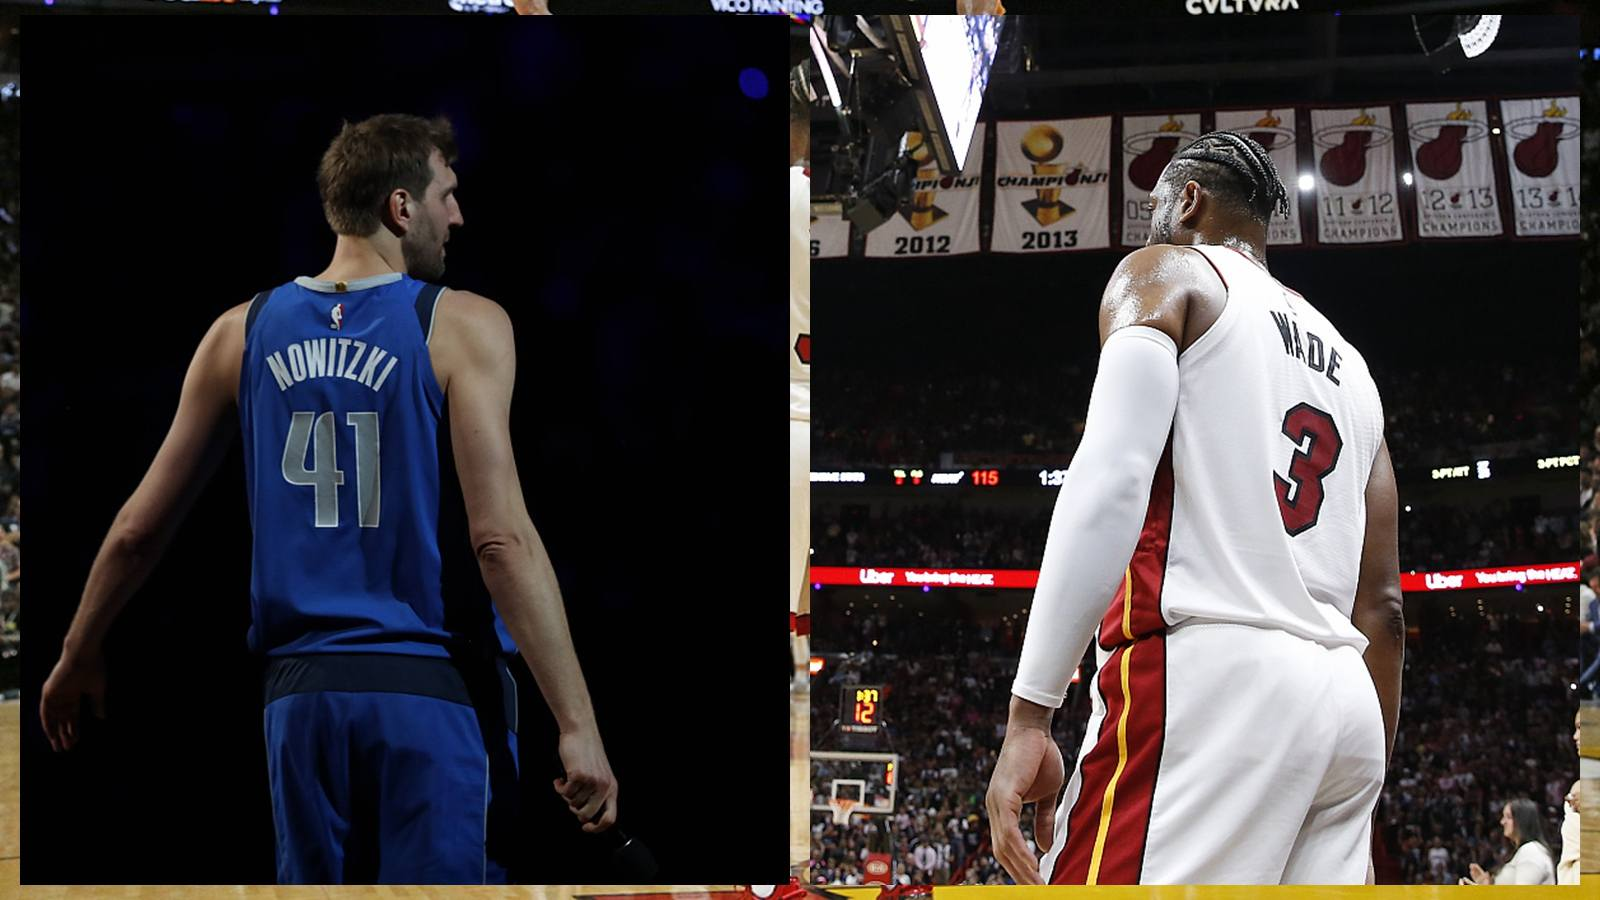 NBA highlights on Feb  27: This is Dwyane Wade's house - CGTN